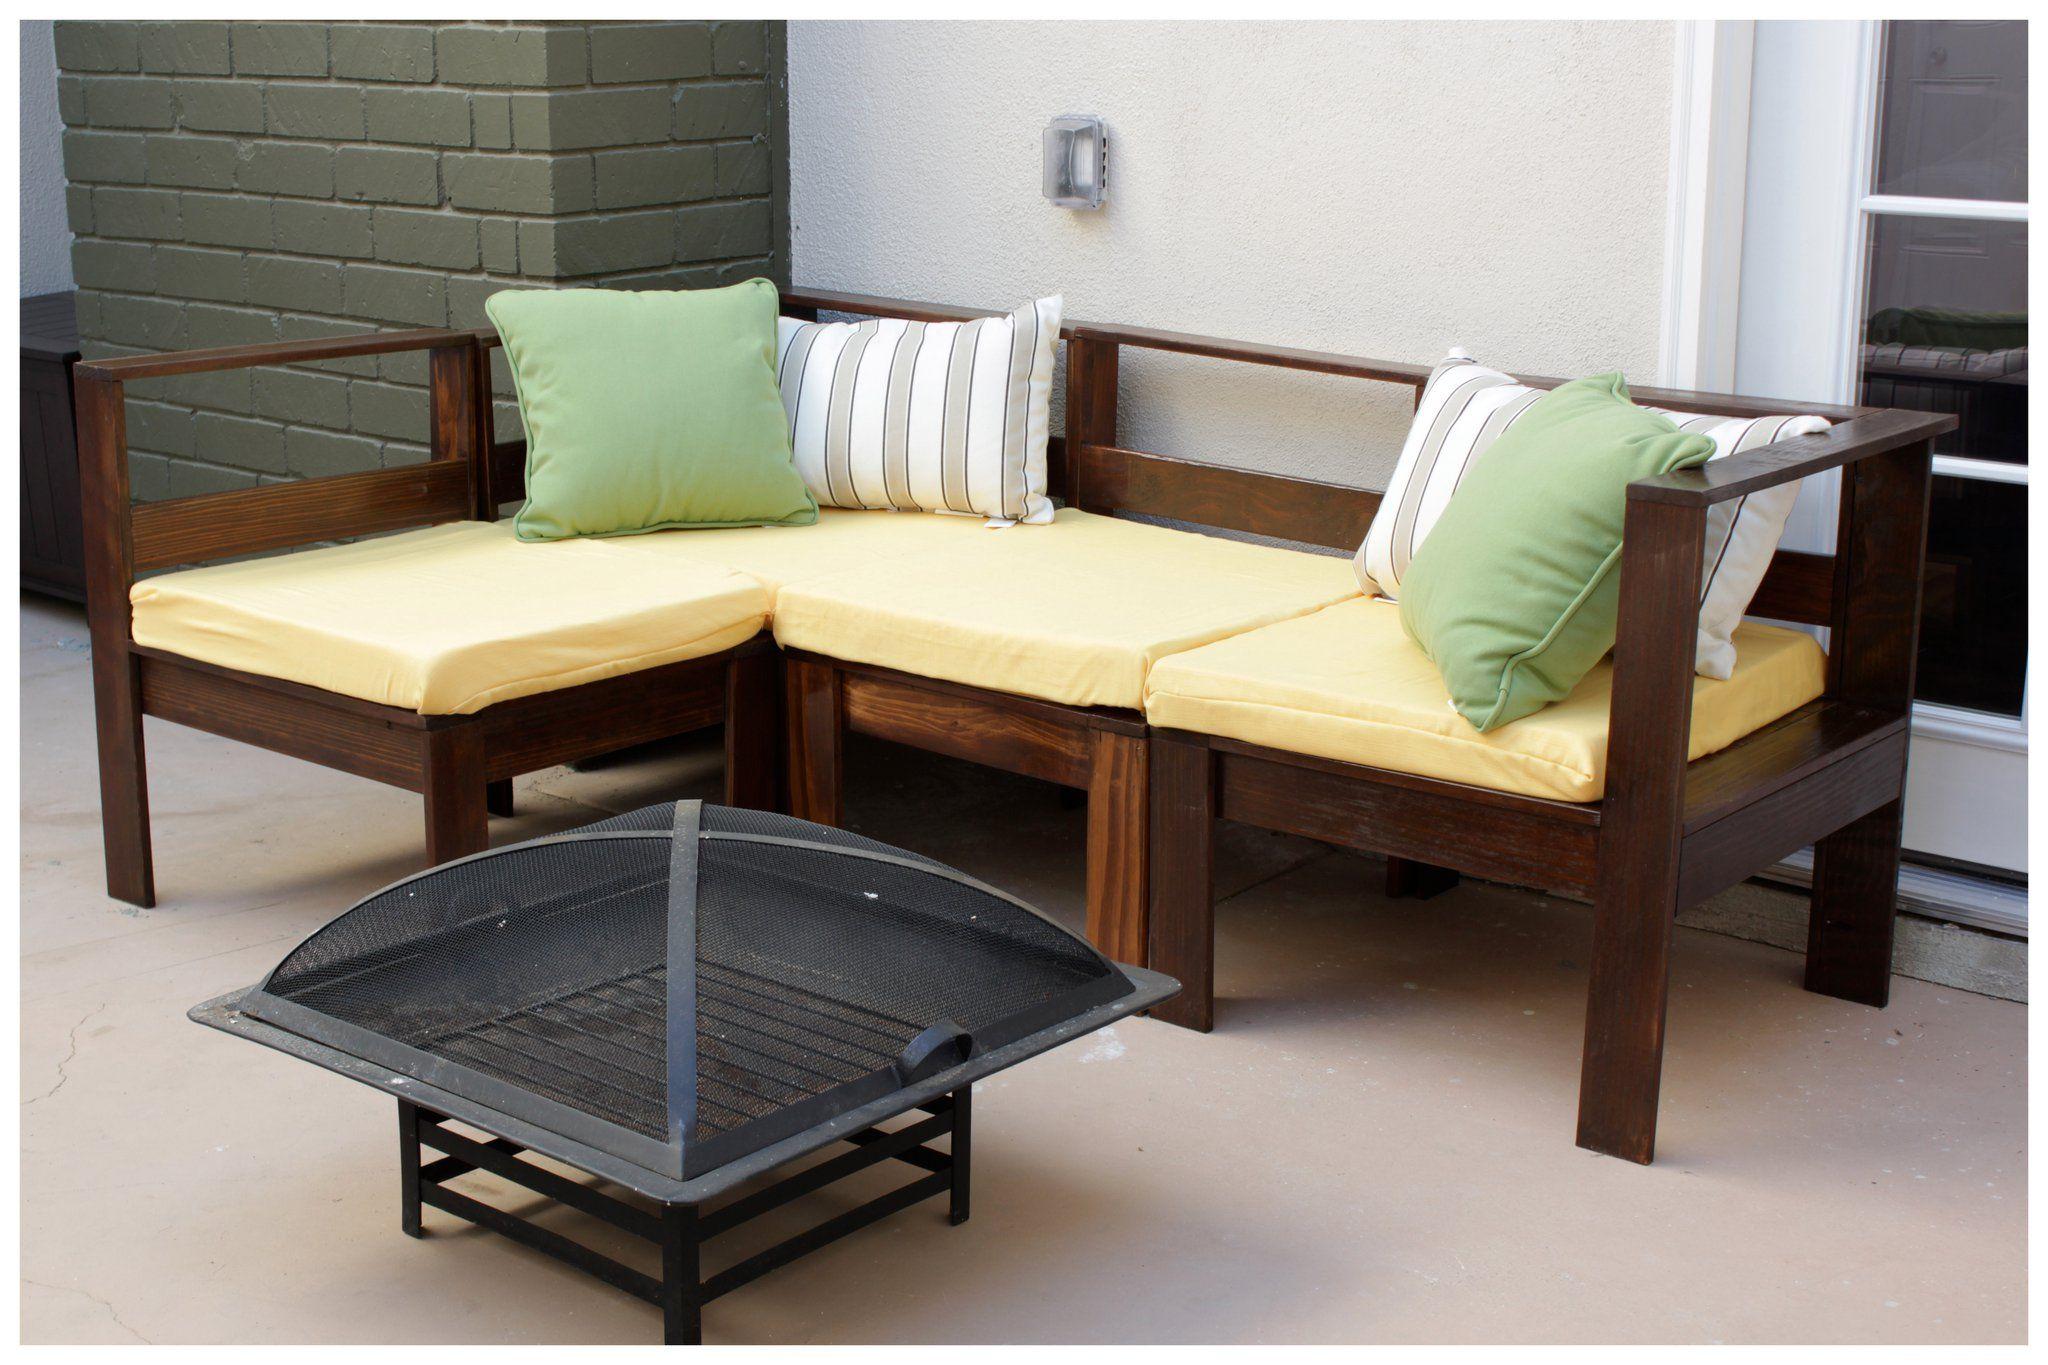 Build Sofa Frame Designs DIY PDF wood furniture hardware